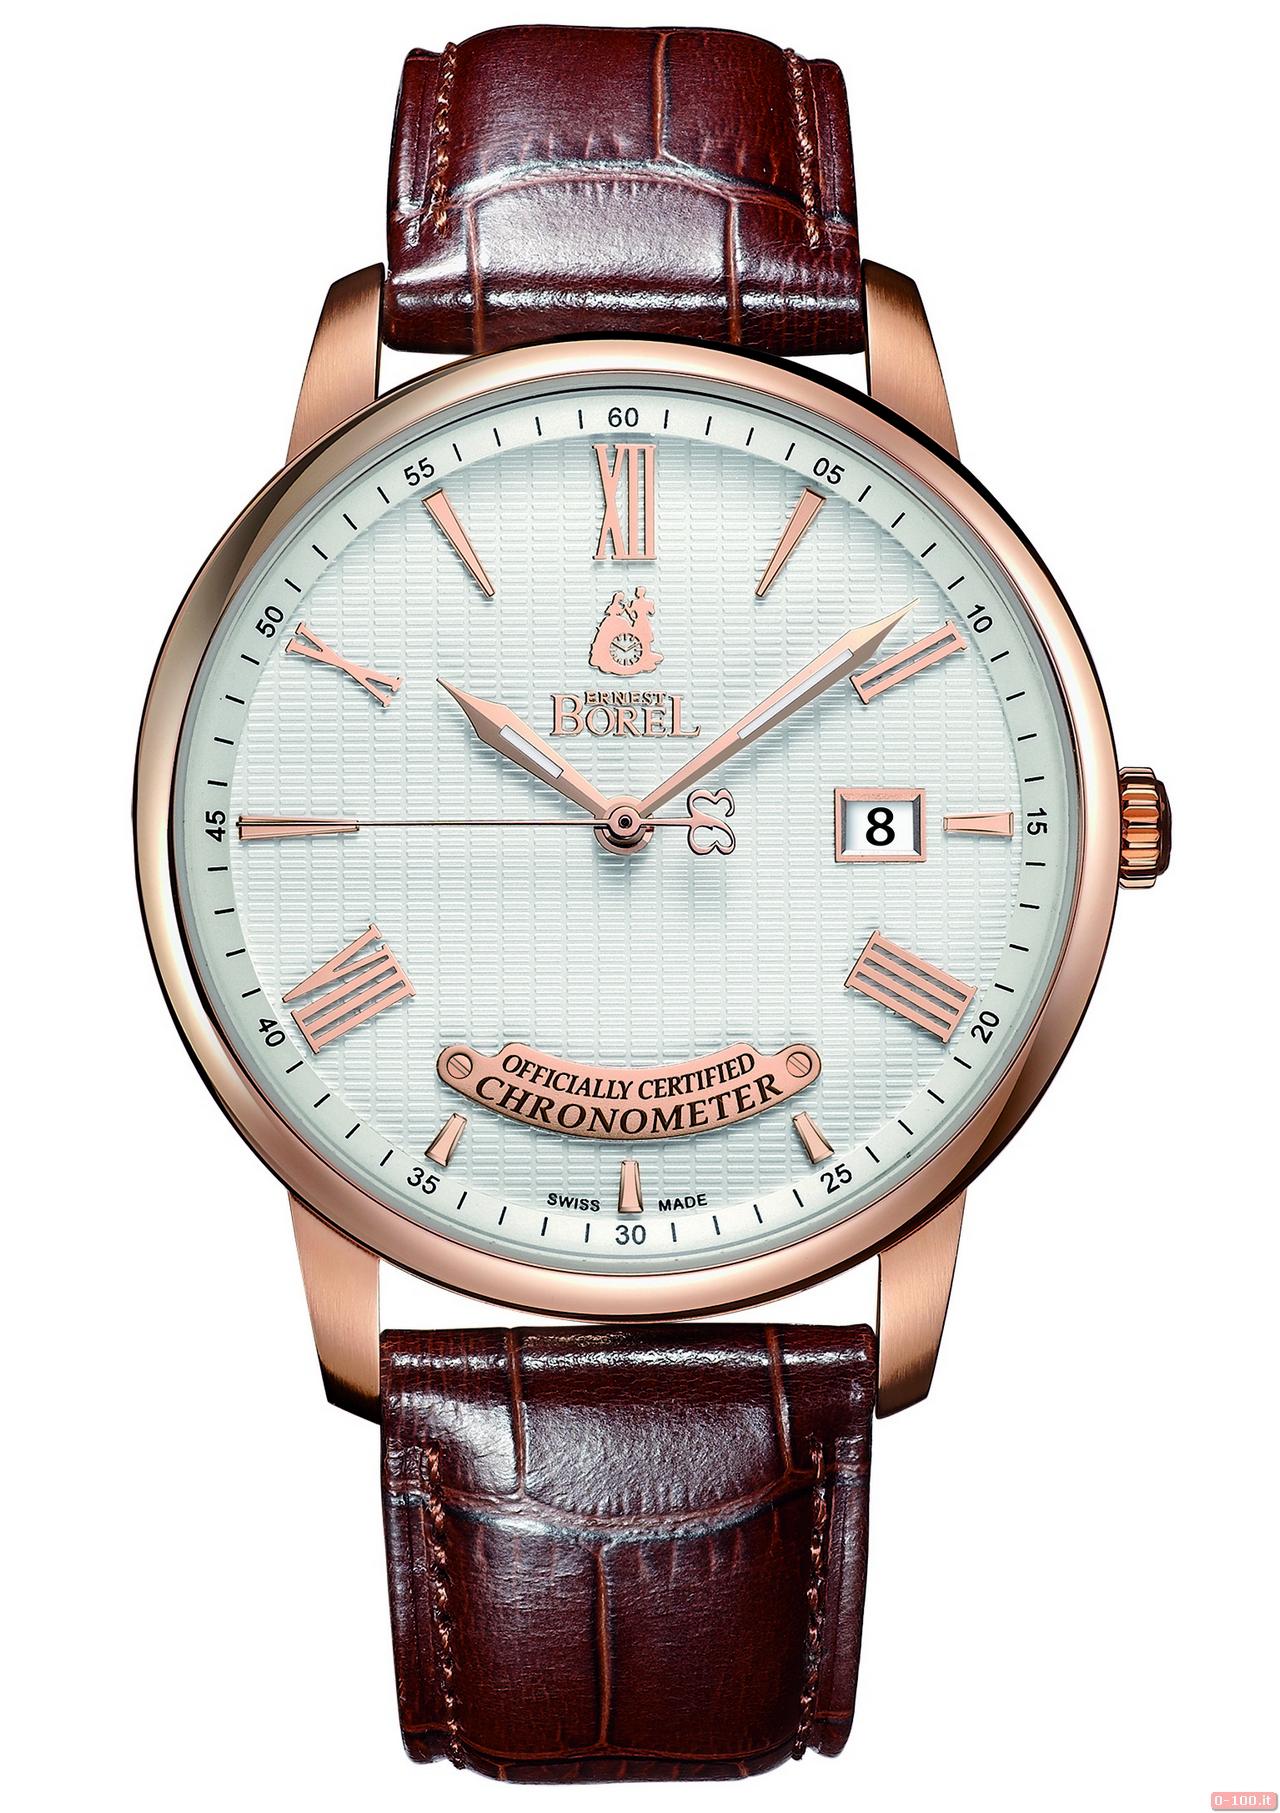 anteprima-baselworld-2014-ernest-borel-jules-borel-officially-certified-chronometer_0-1003